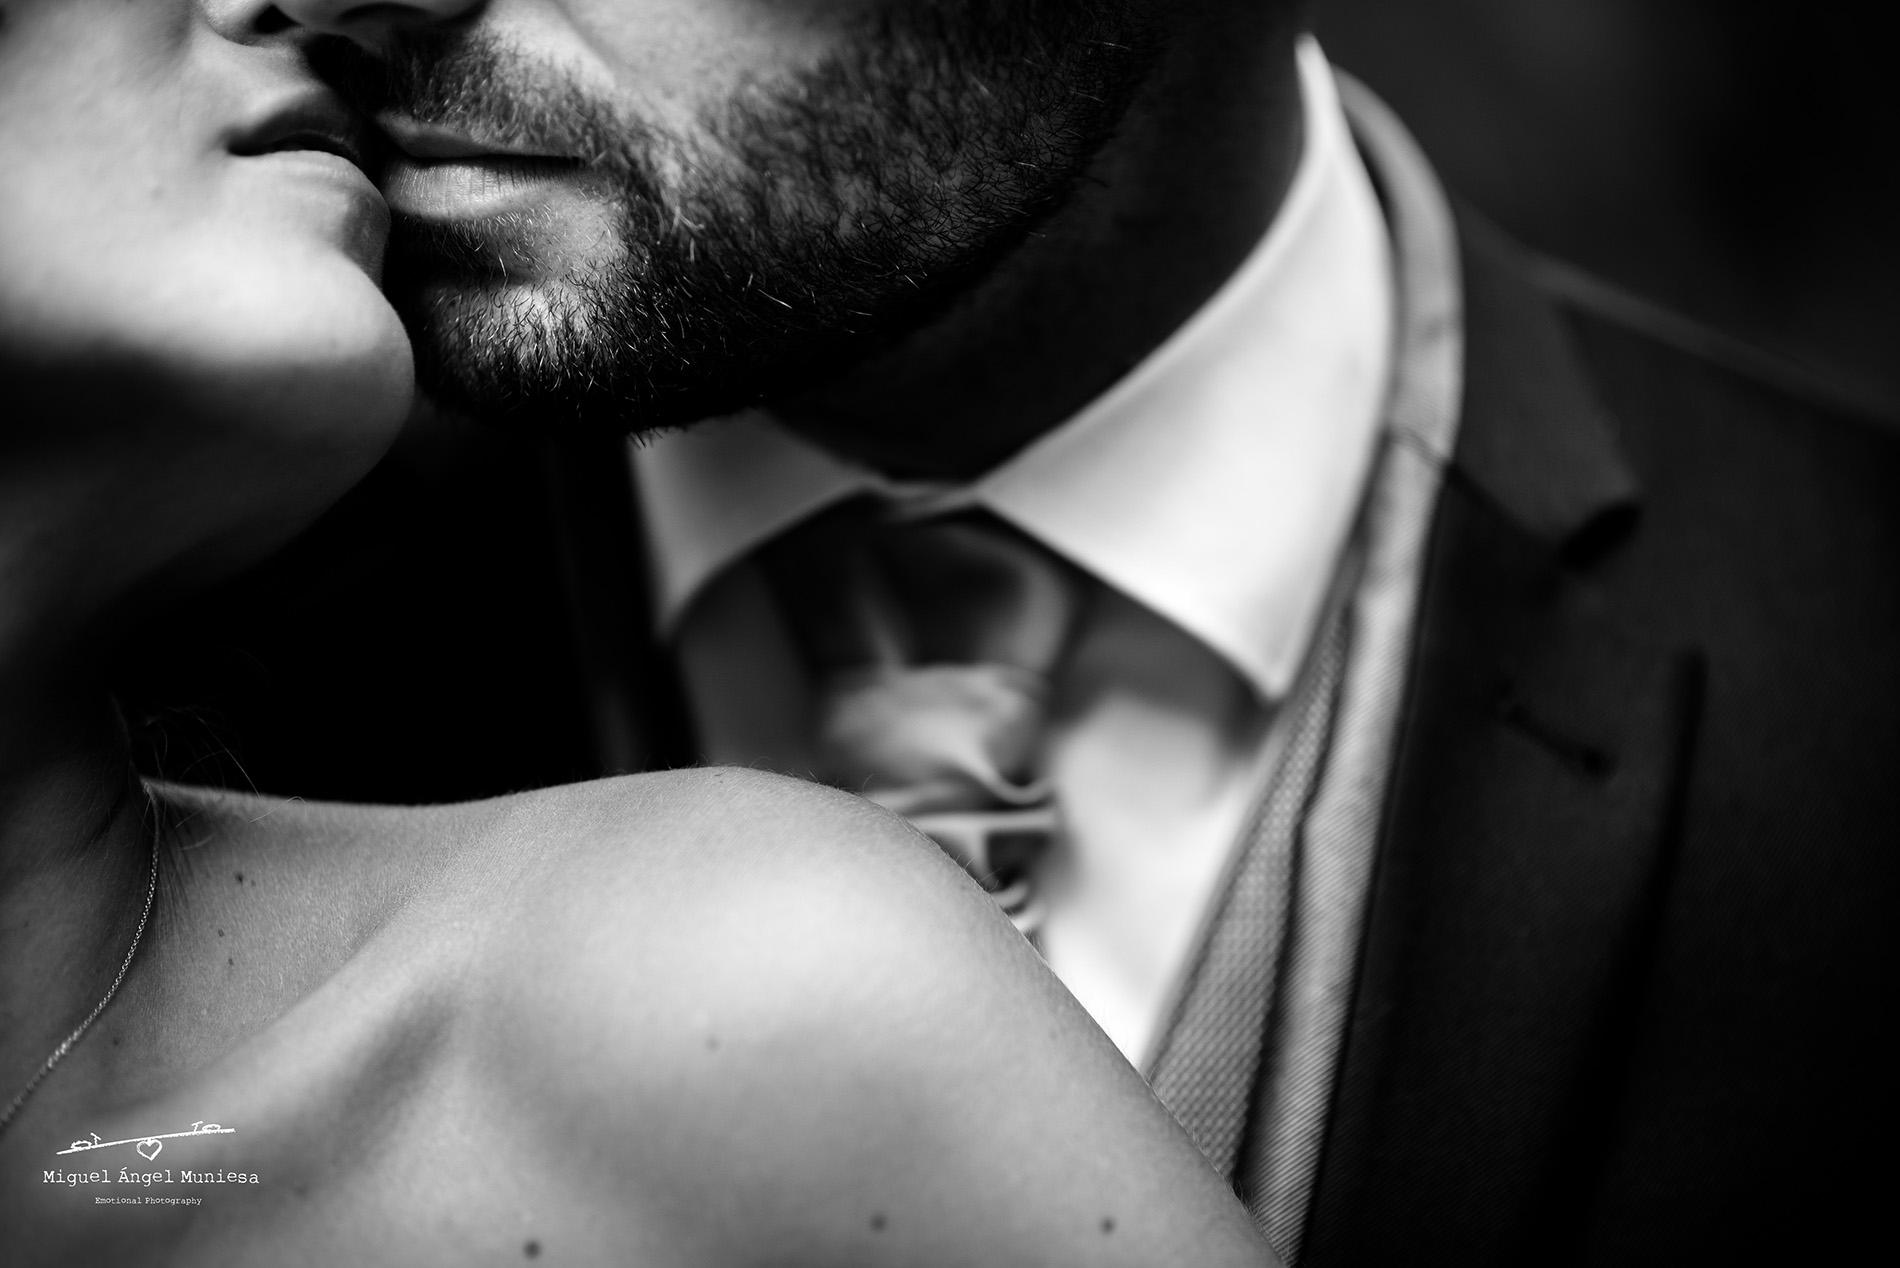 miguel angel muniesa, boda, fotografo de boda, boda zaragoza, wedding photographer, miguel angel muniesa emotional photography, destination wedding_051